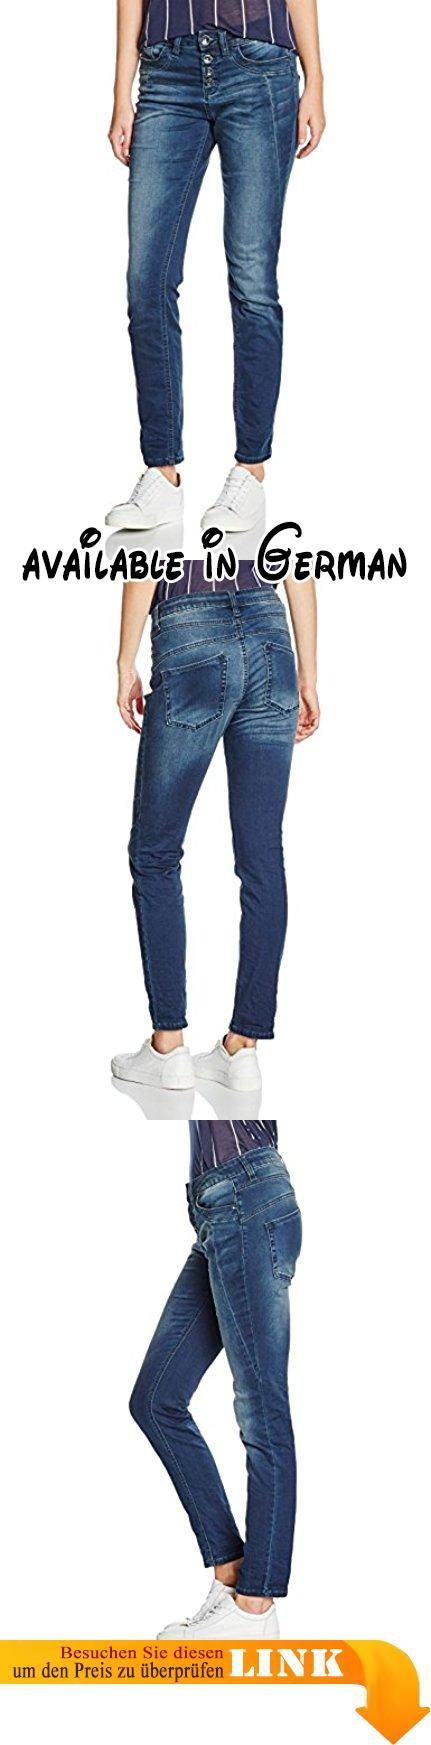 TOM TAILOR Damen Jeanshose Jeans Relaxed Tapered Denim Blau (Stone Wash Denim 1054), W30/L30 (Herstellergröße: 30). Relaxed #Apparel #PANTS